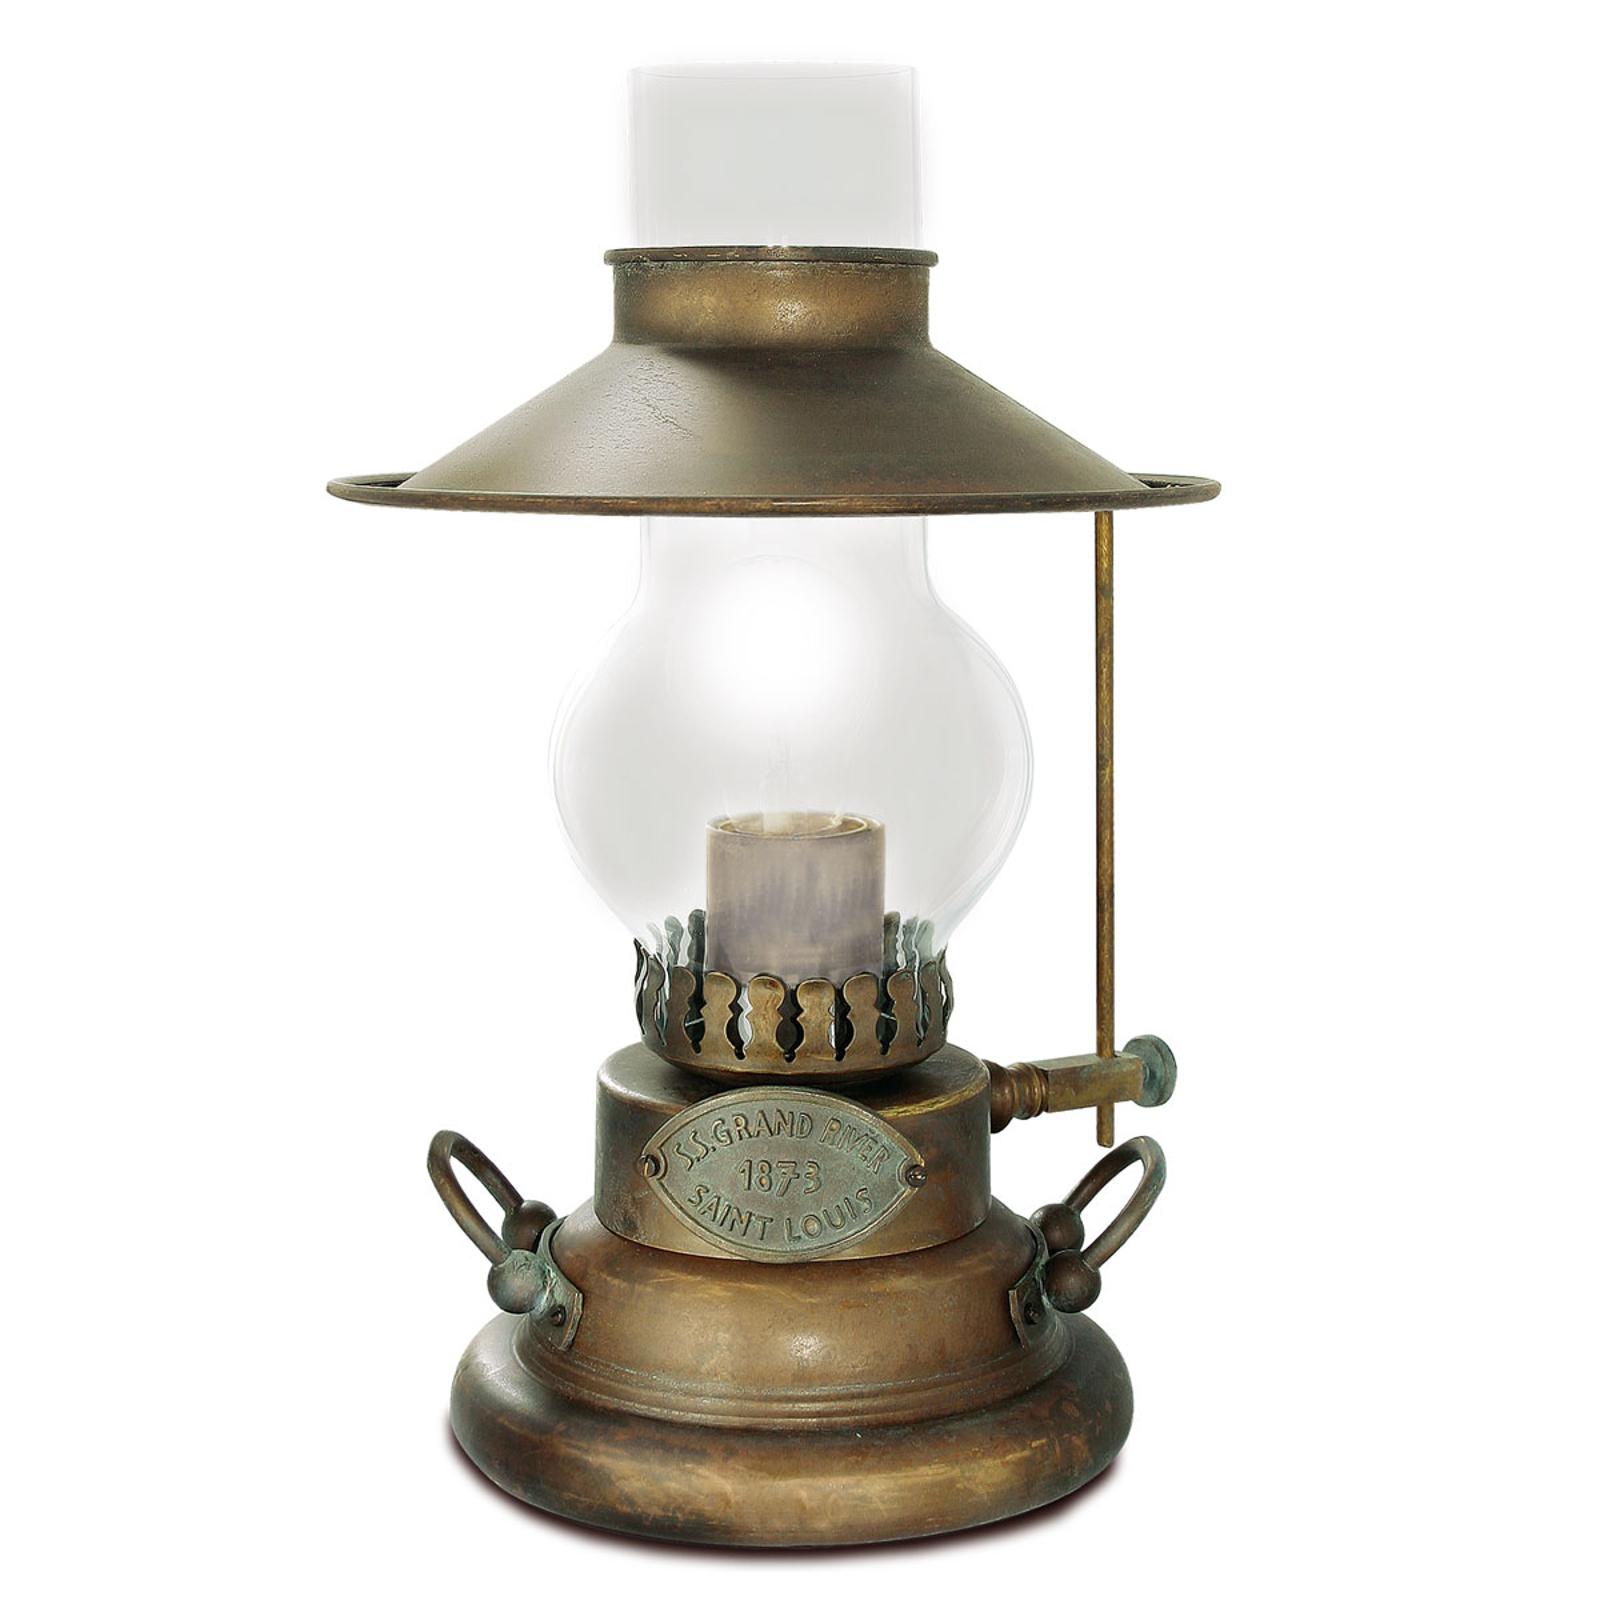 Tafellamp Guadalupa uit oude tijden